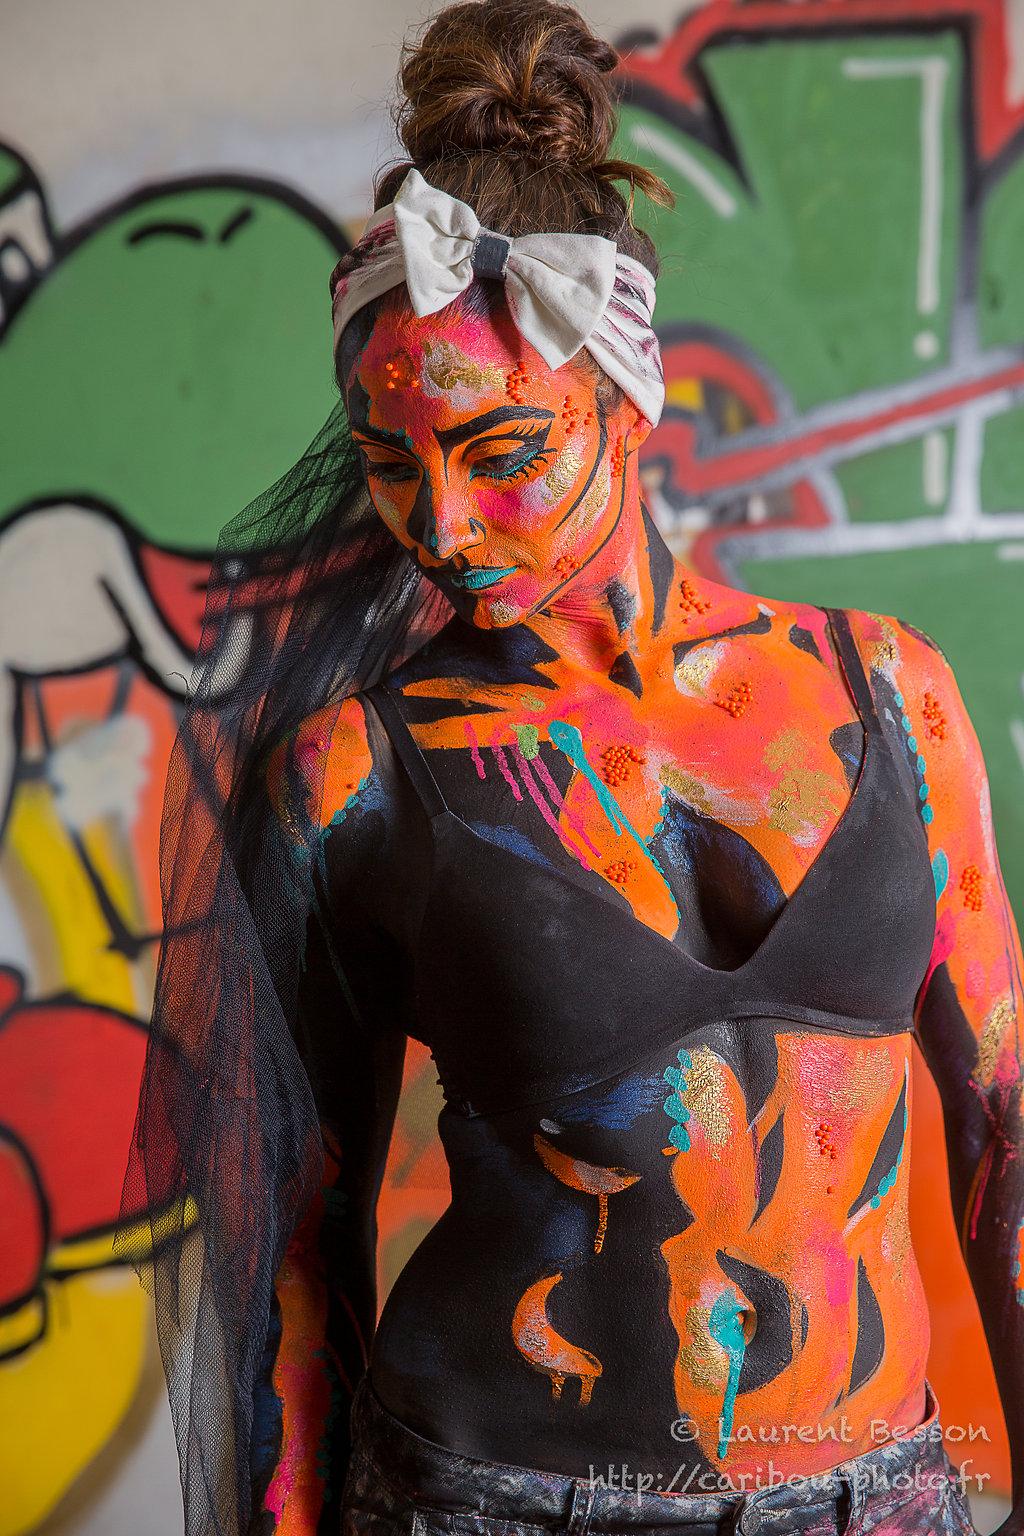 Power pop girl, Paris, Sep 2016